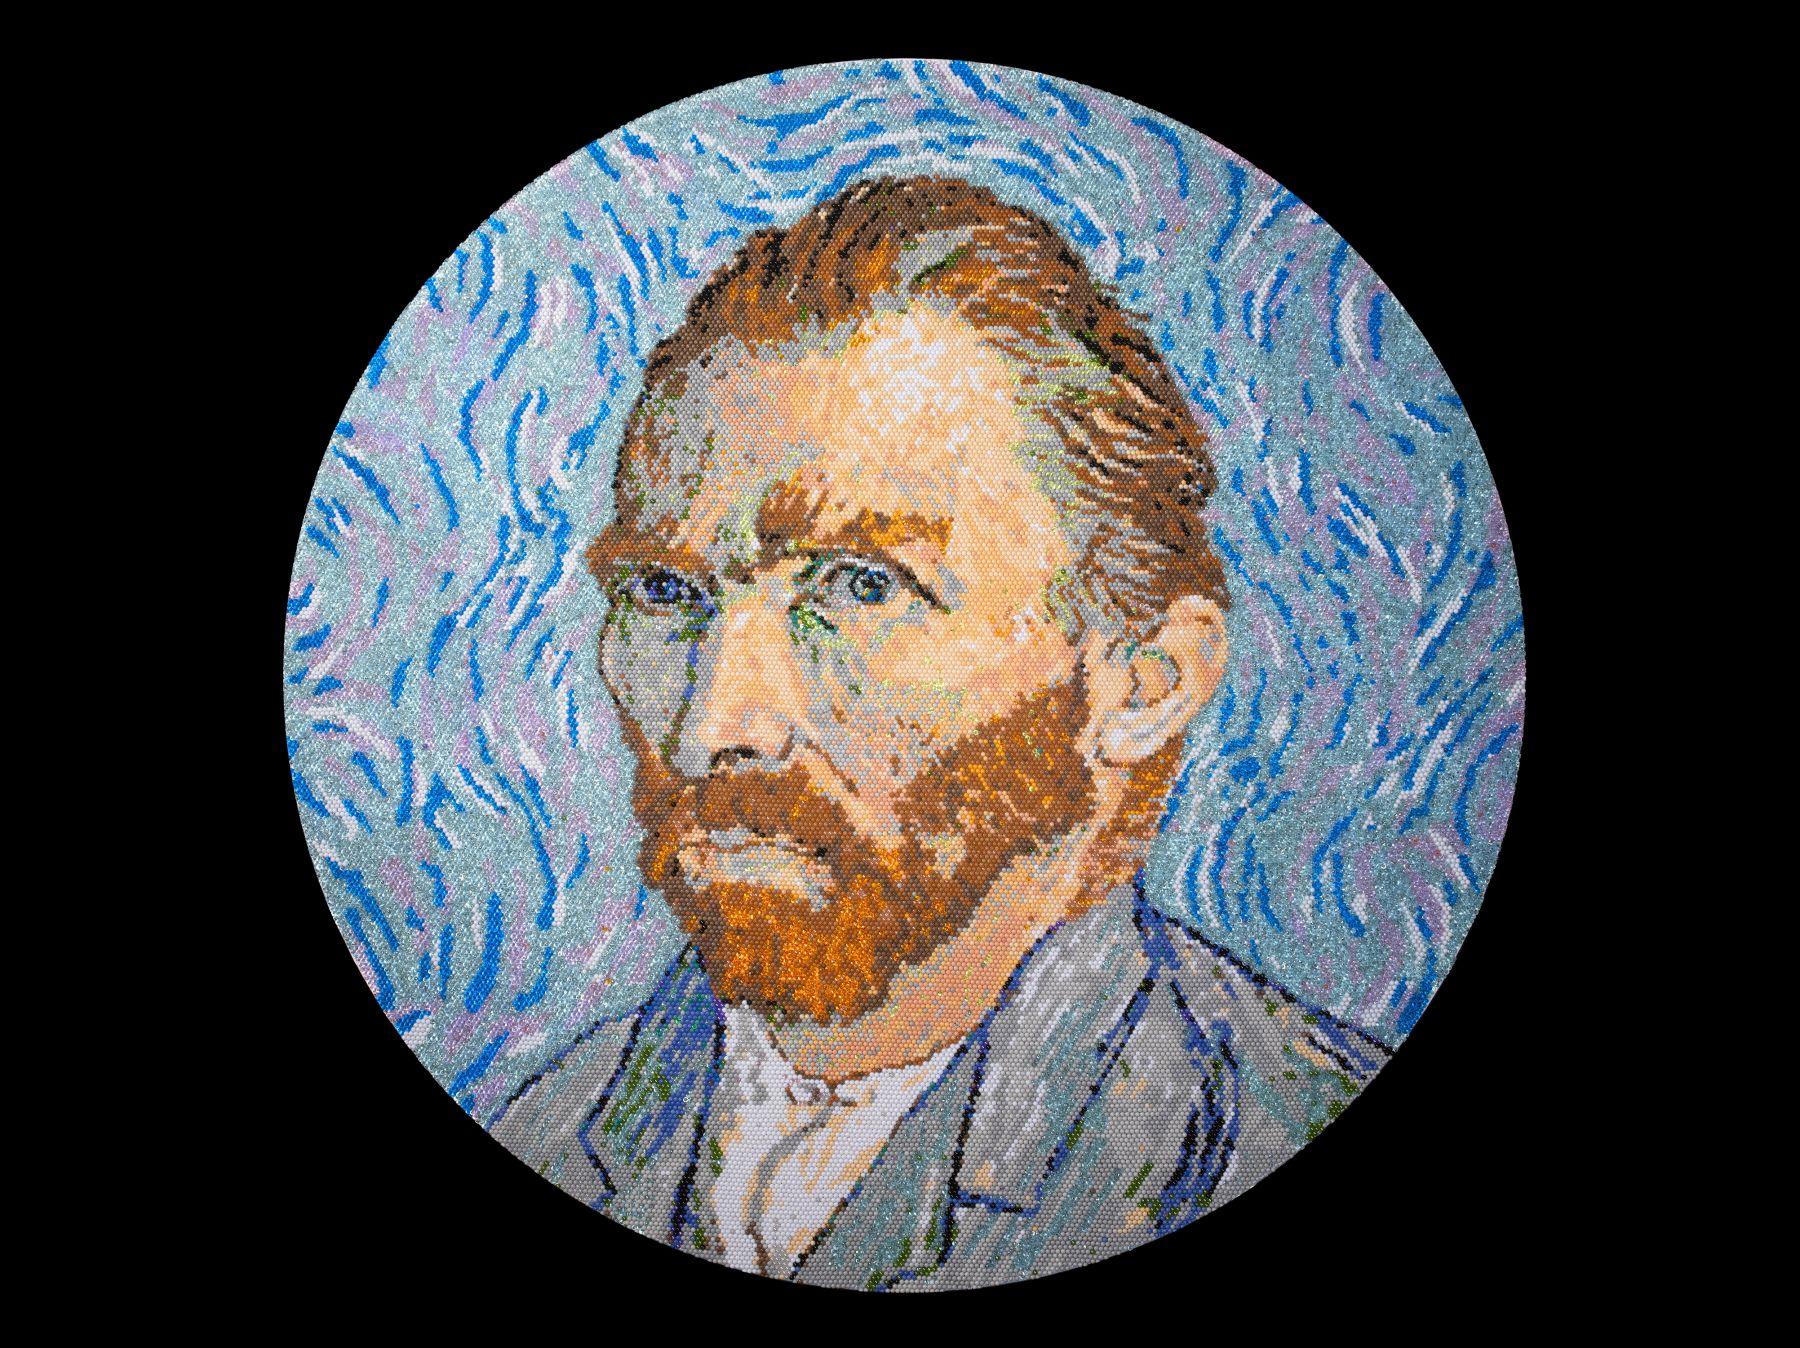 david mach, Van Gogh, 2013, pushpins, 39 1/4 inches diameter